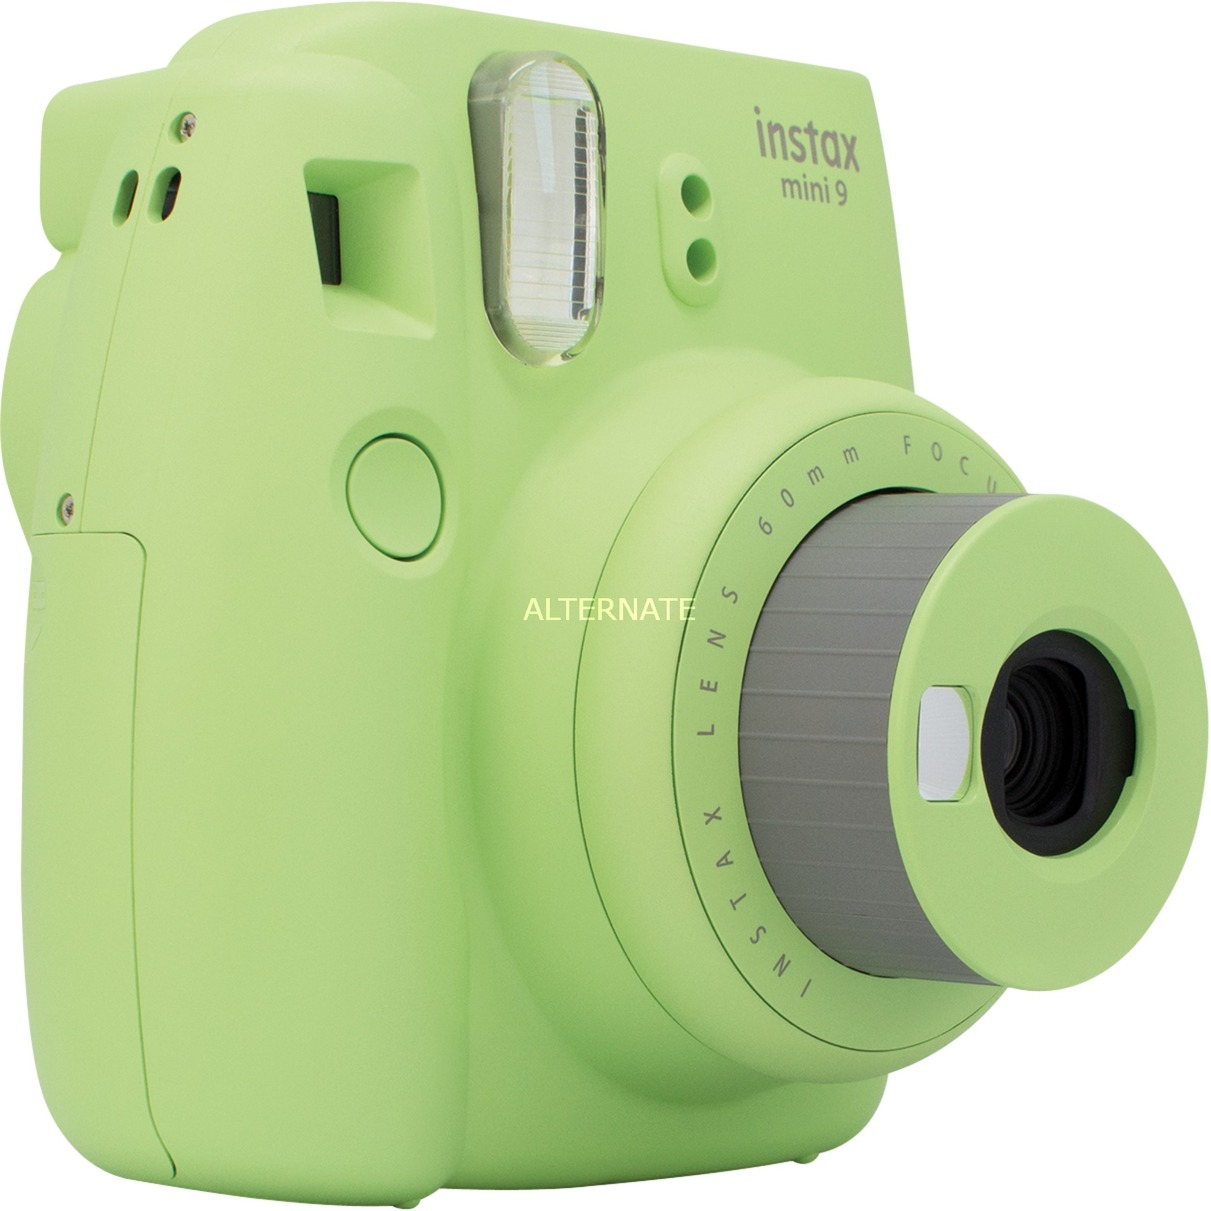 Instax Mini 9 62 x 46mm Verde, Cal cámara instantánea impresión